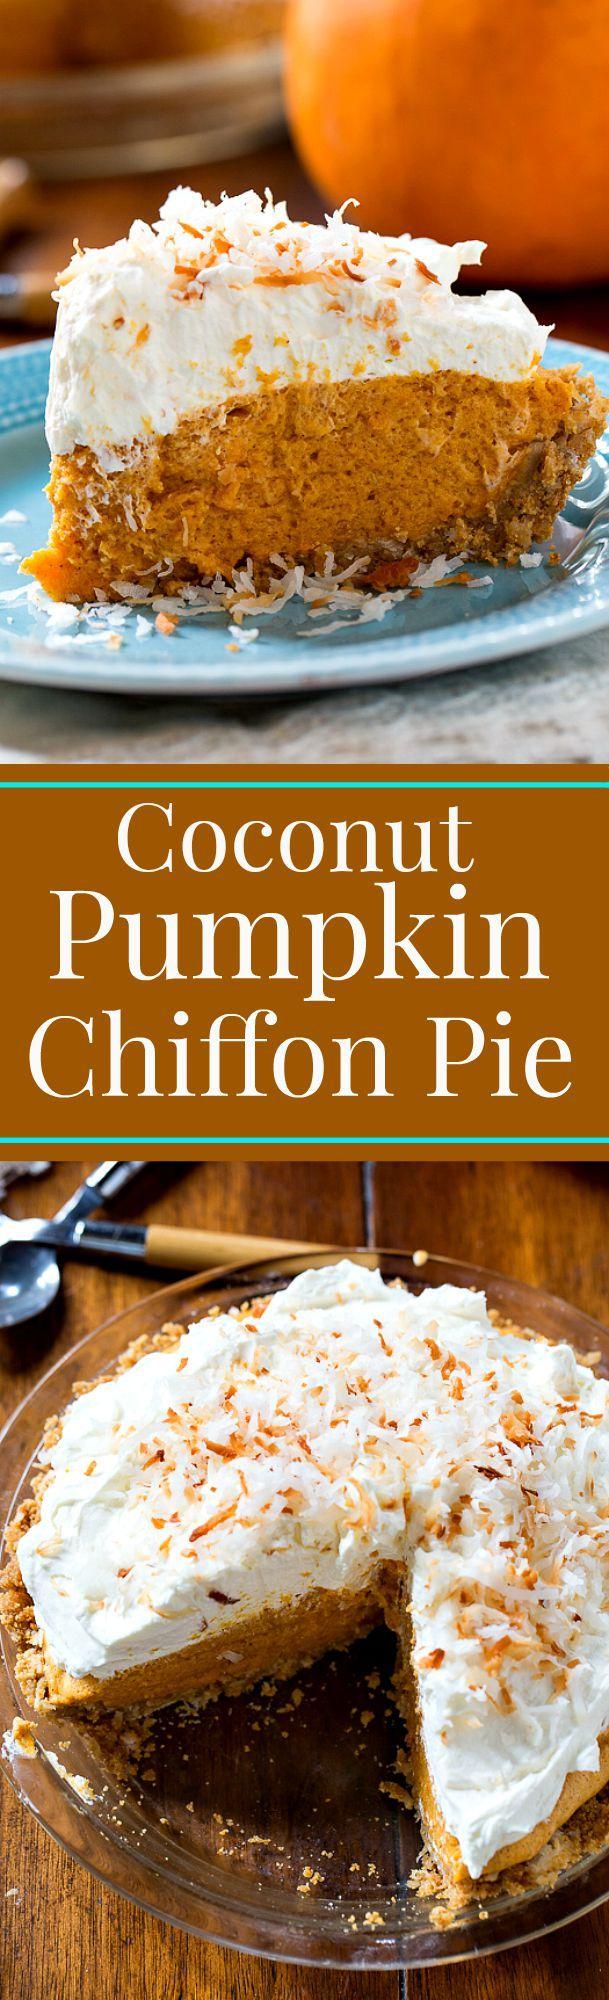 Coconut Pumpkin Chiffon Pie with mascarpone whipped cream.